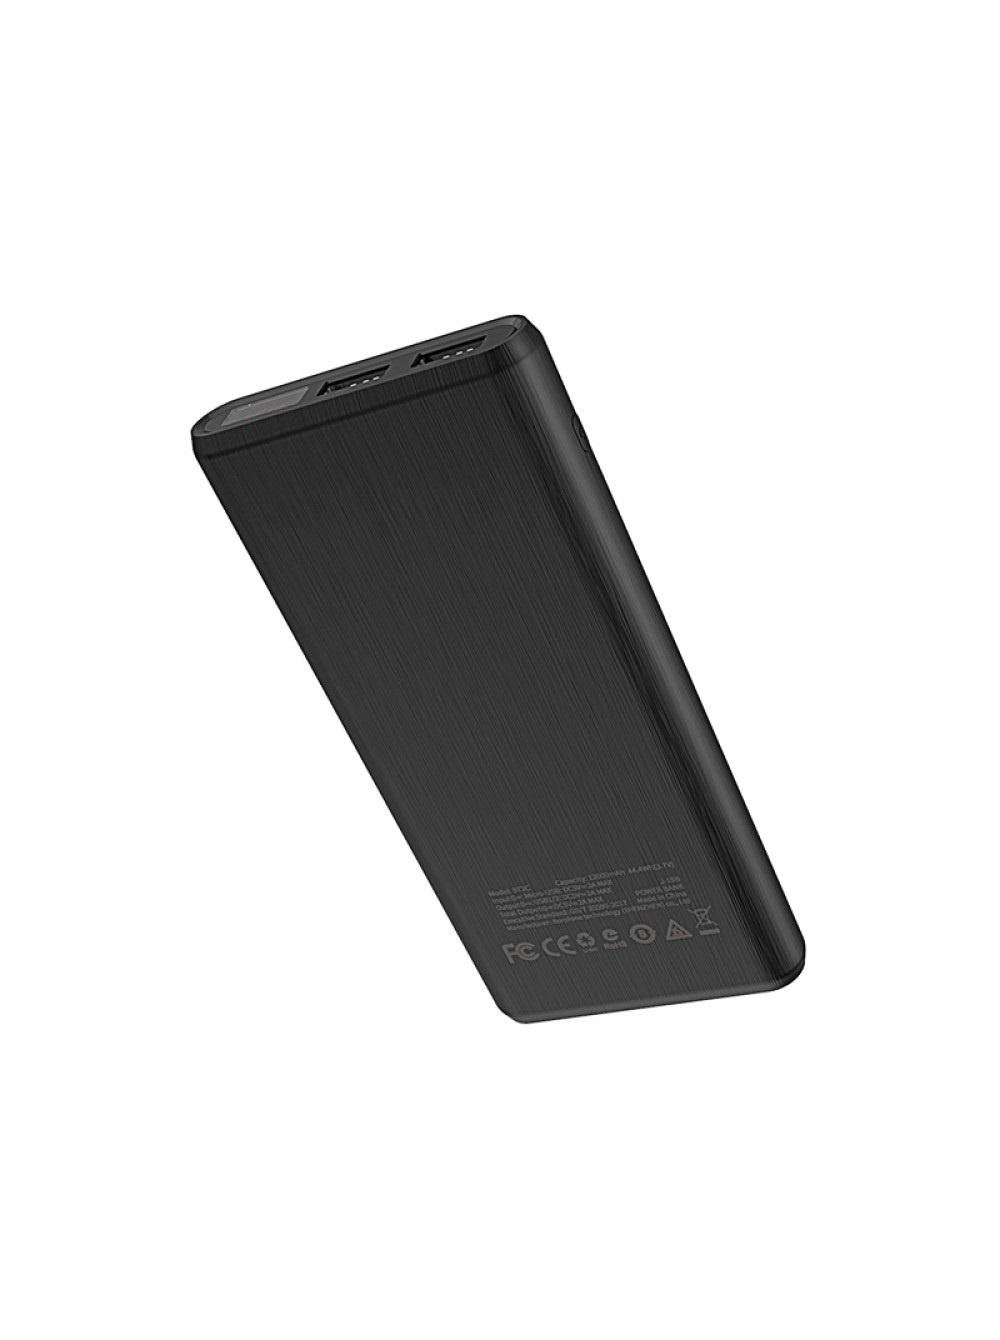 Внешний аккумулятор Borofone BT2C Fullpower mobile power bank 12000mAh Black Borofone